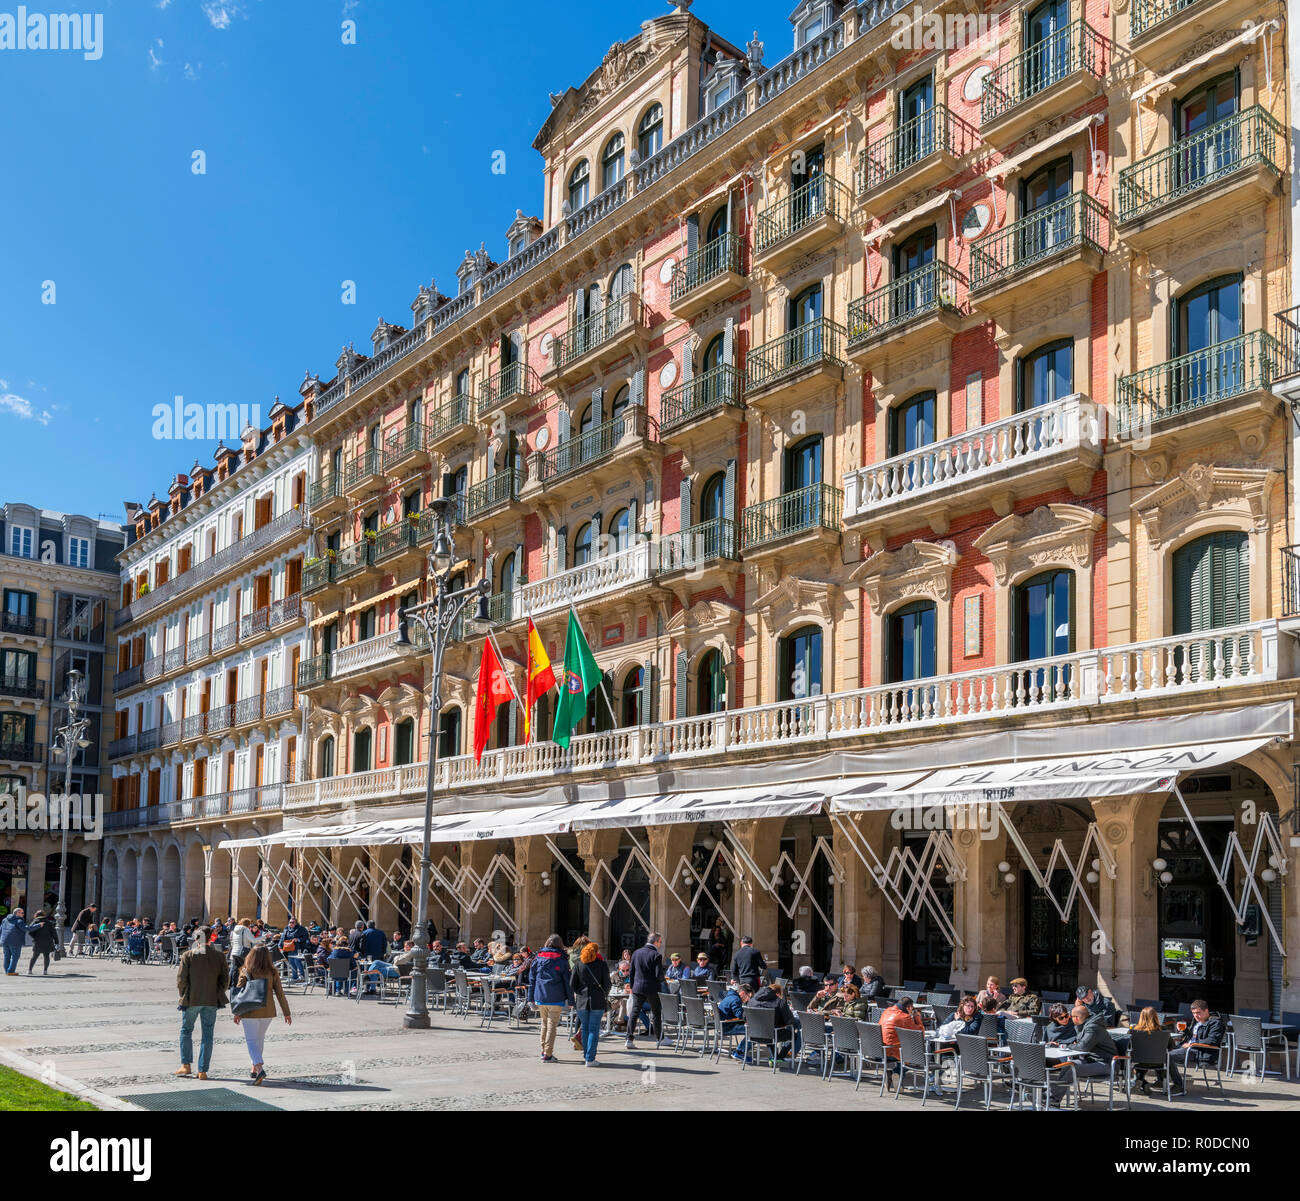 The Cafe Iruna in the old town (casco antiguo), haunt of Ernest Hemingway, Plaza del Castillo, Pamplona, Navarra, Spain - Stock Image